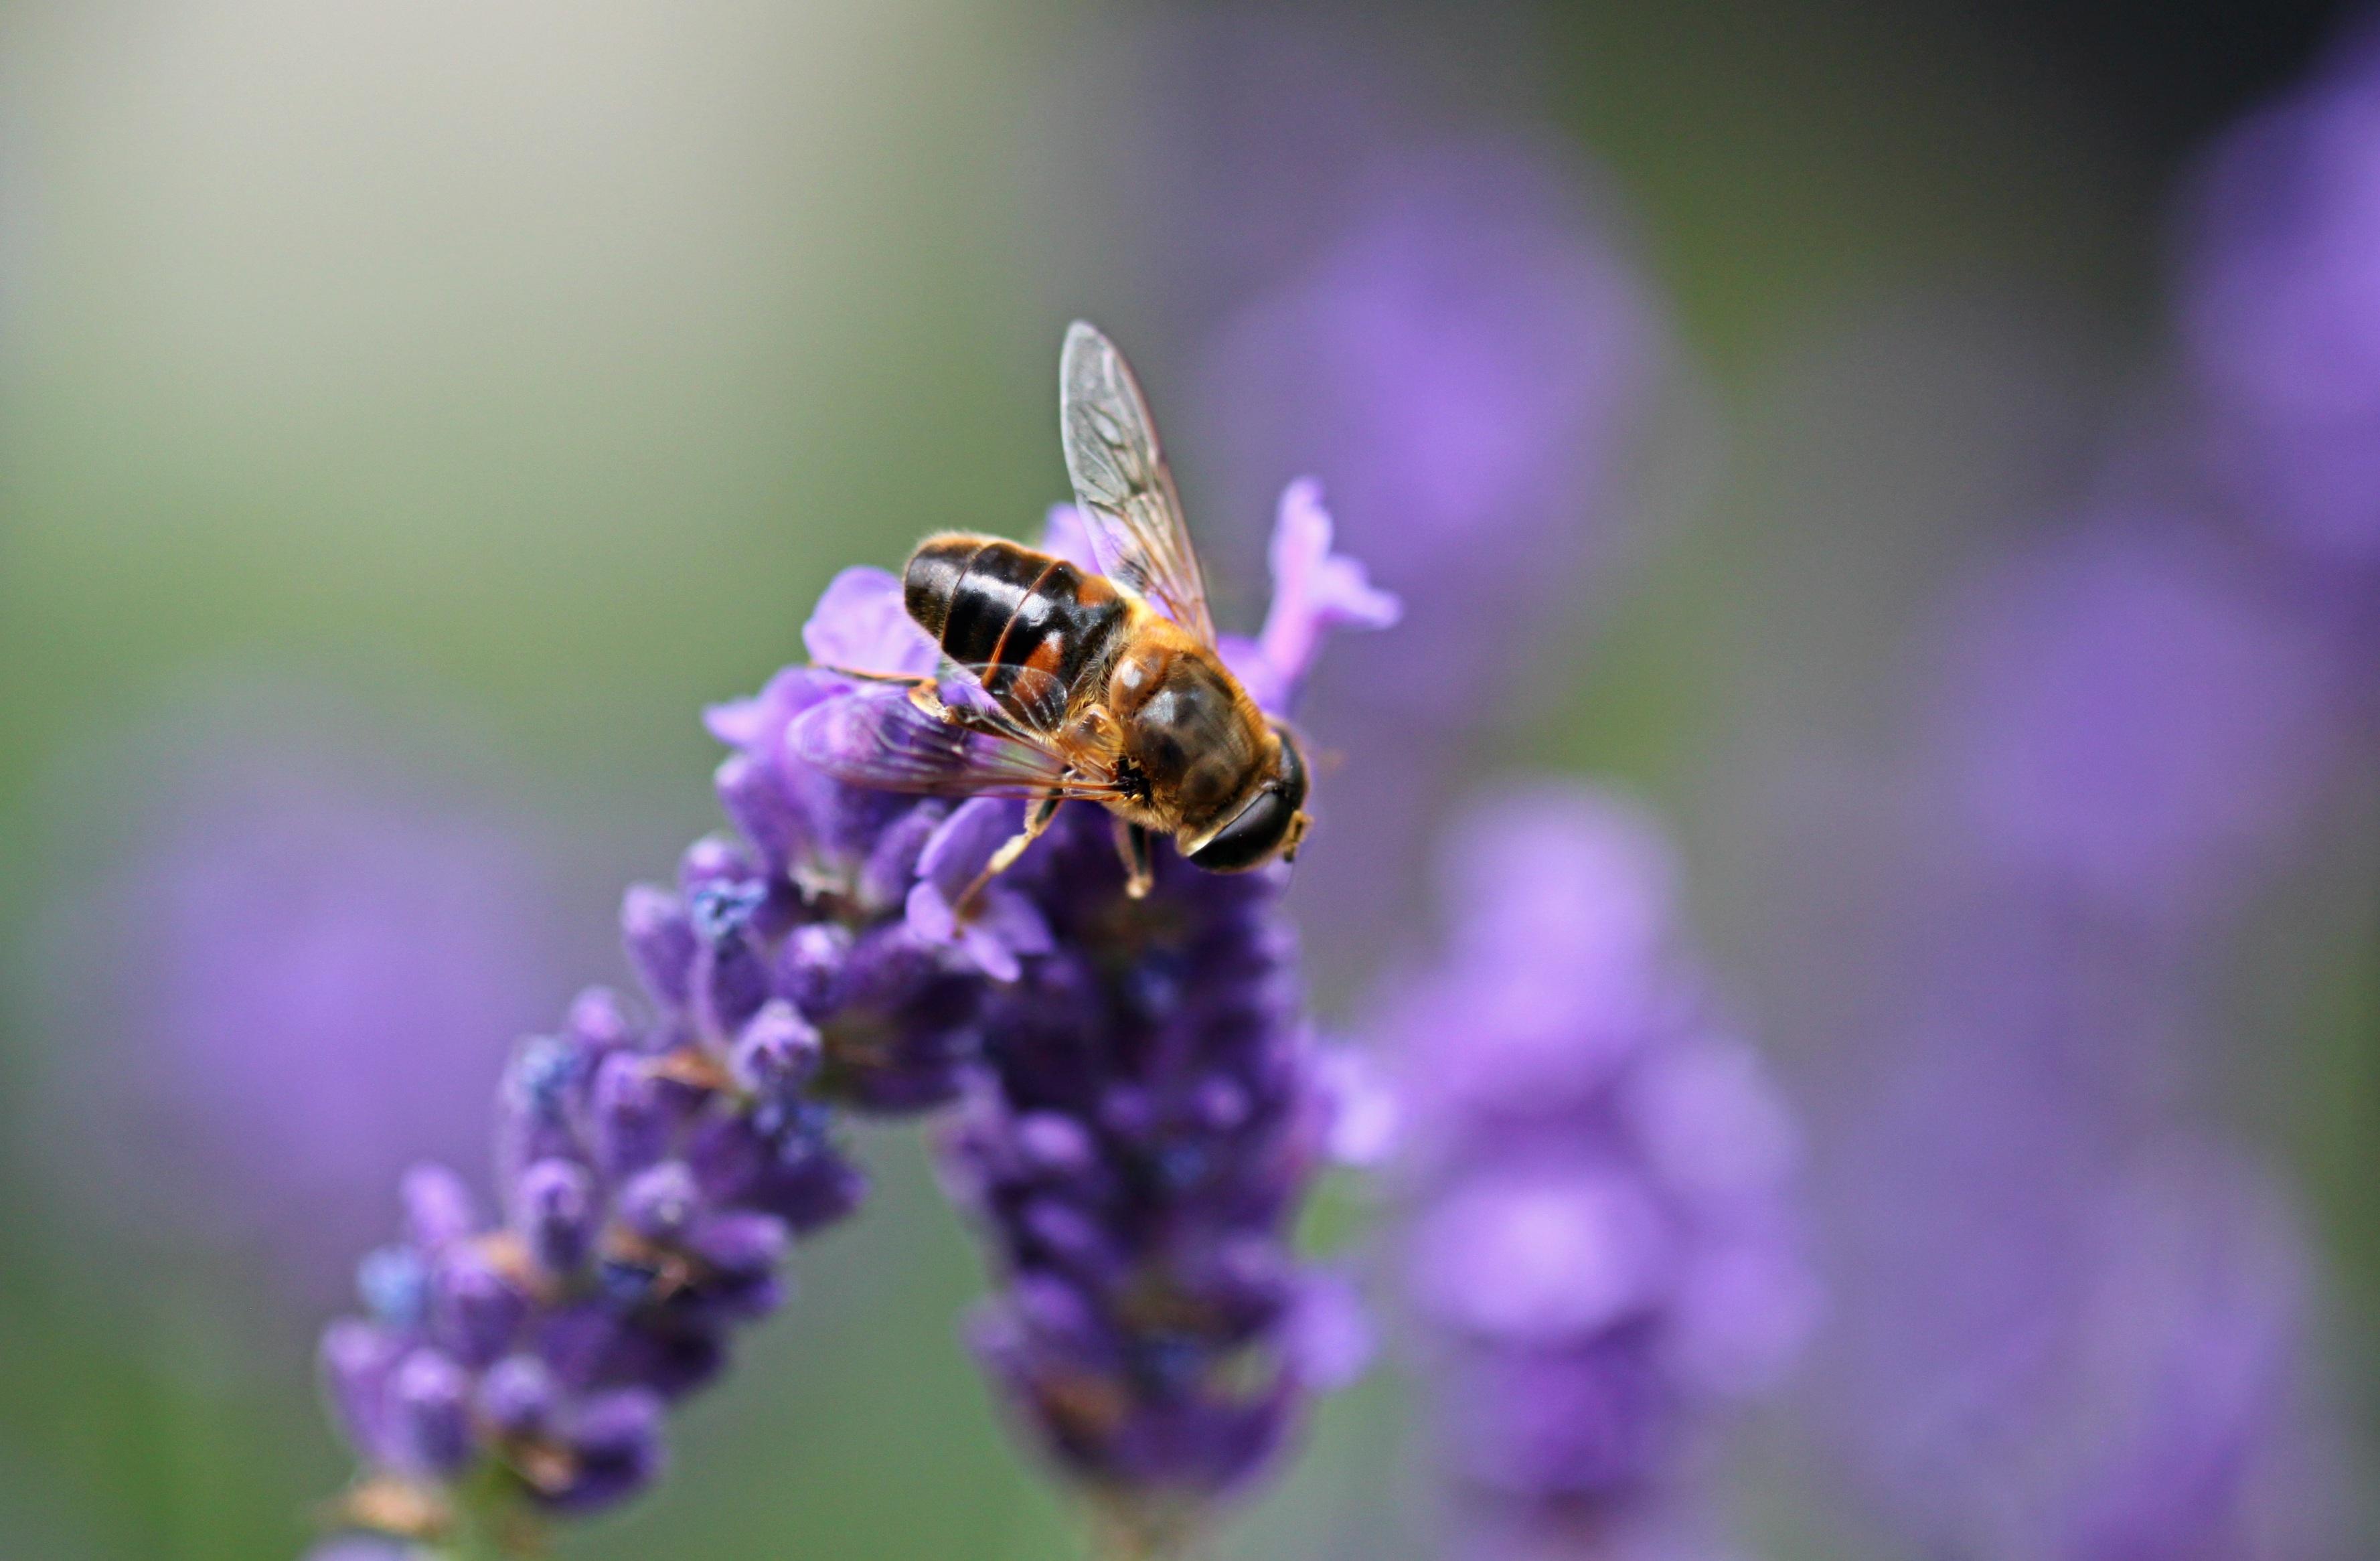 Hd Lavender Wallpaper Bee On Purple Lavender 183 Free Stock Photo